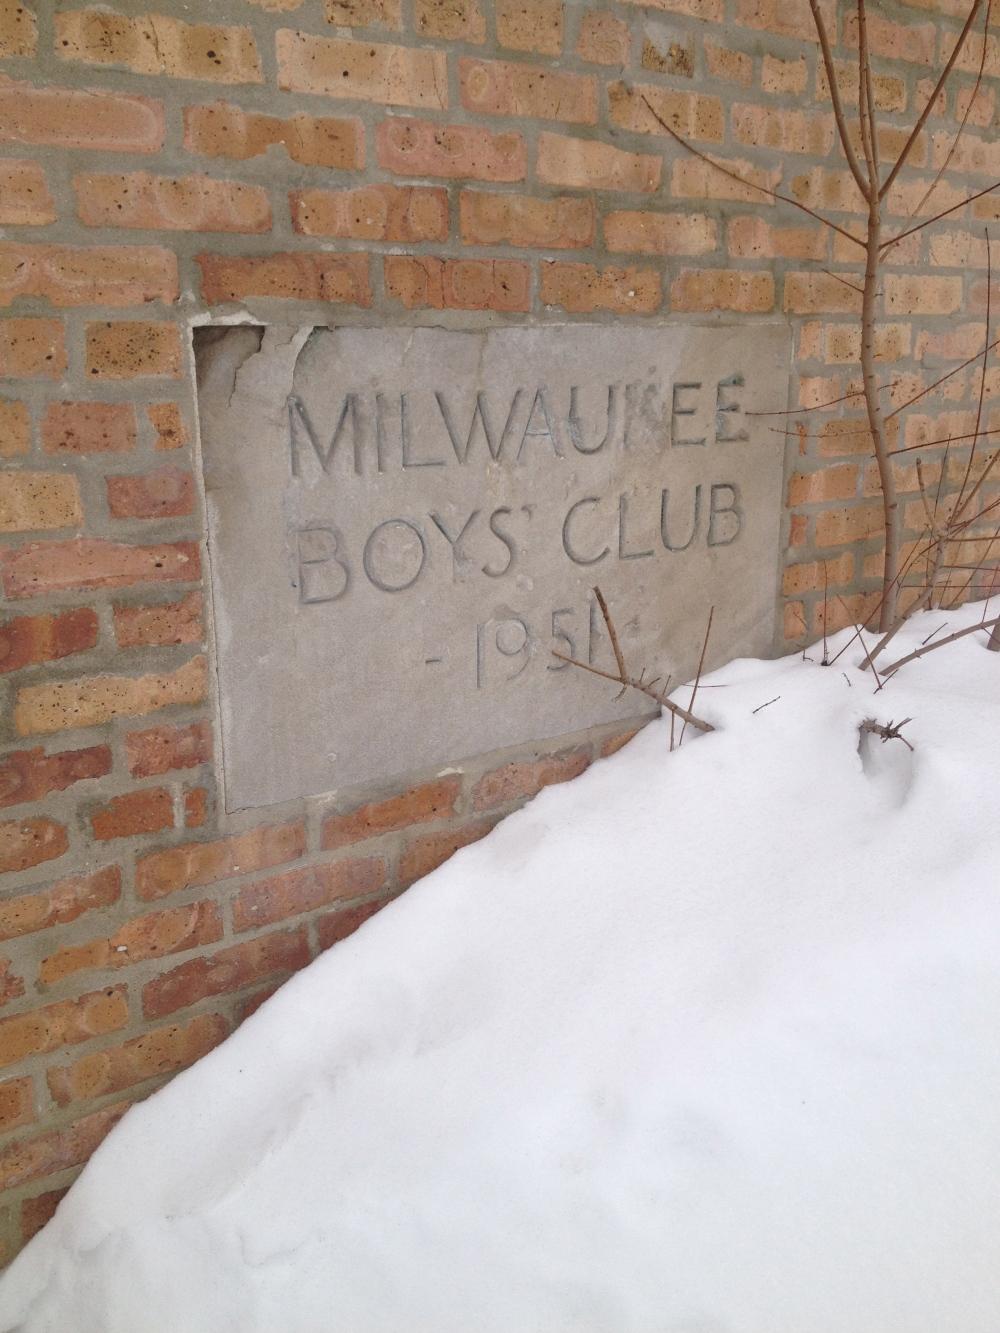 Milwaukee_Boys_Club_1951